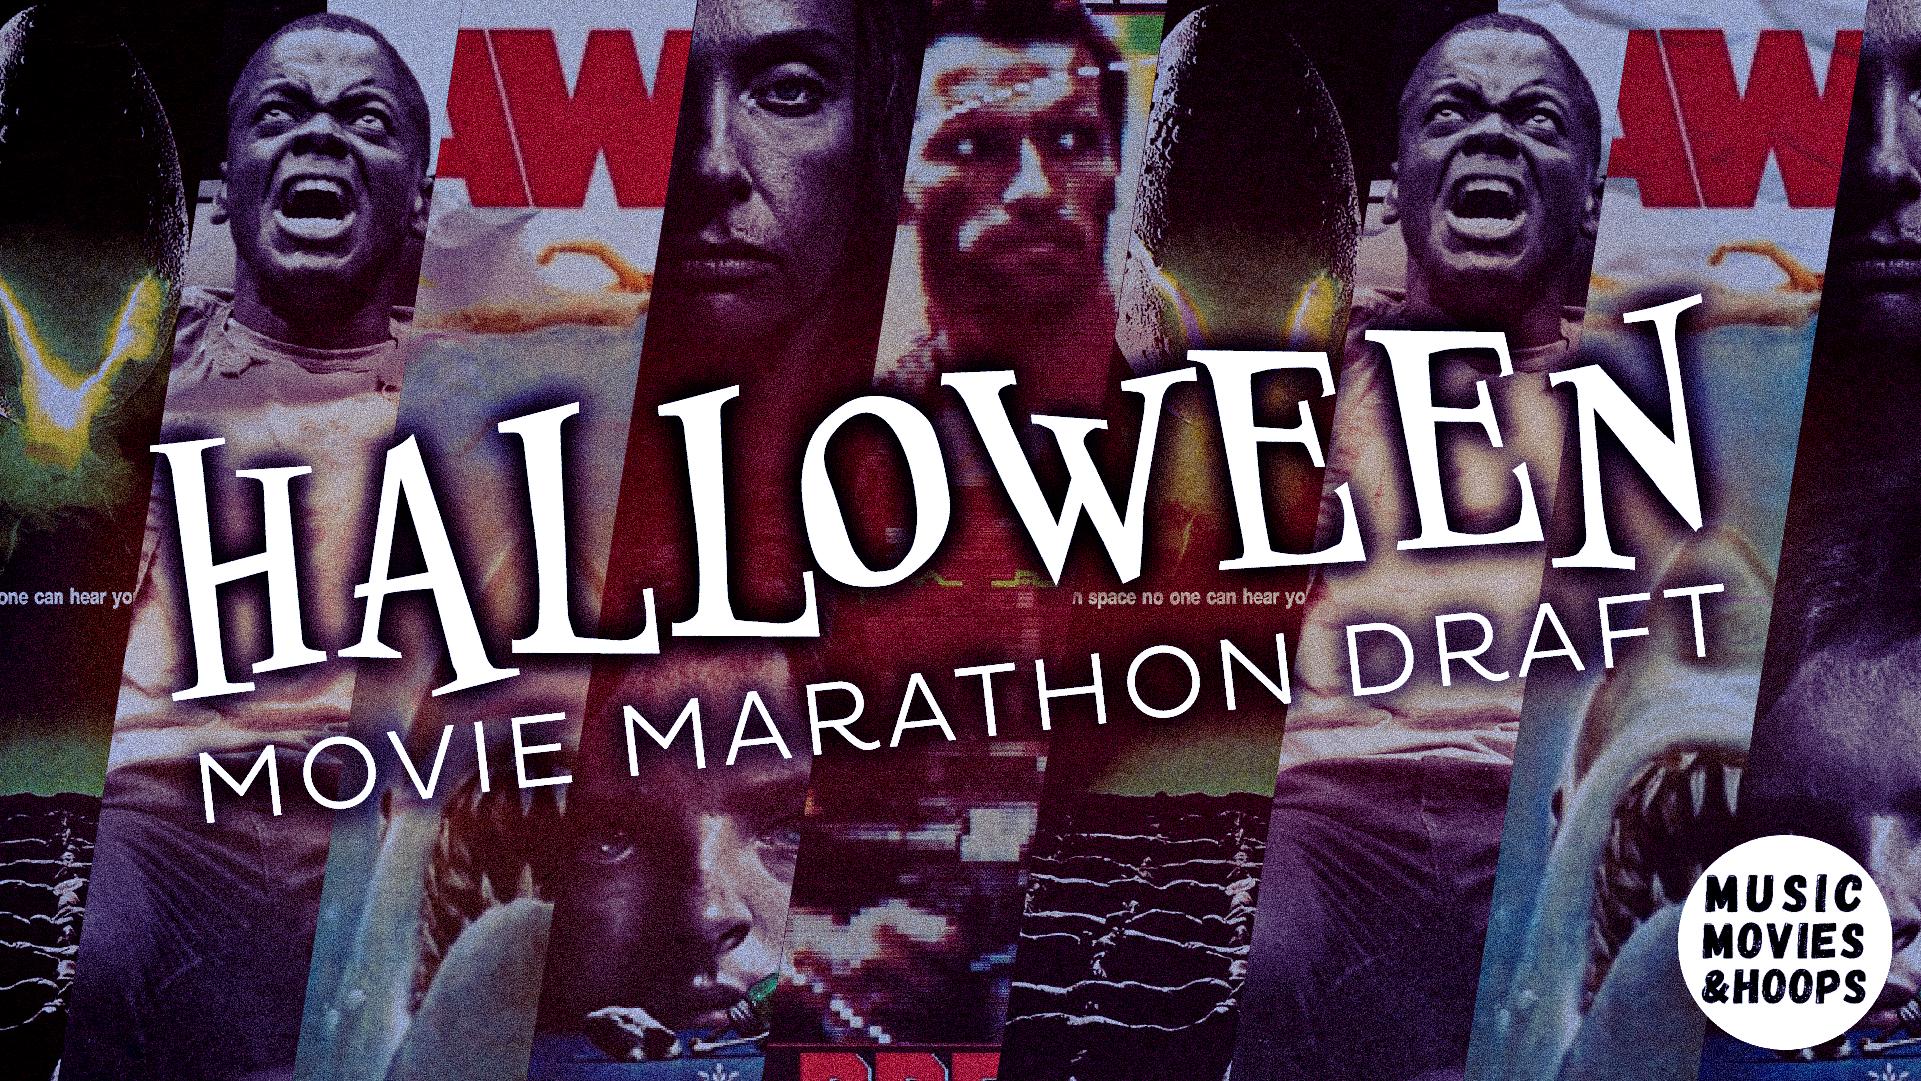 MMH Fantasy Drafts | The Halloween Marathon Draft